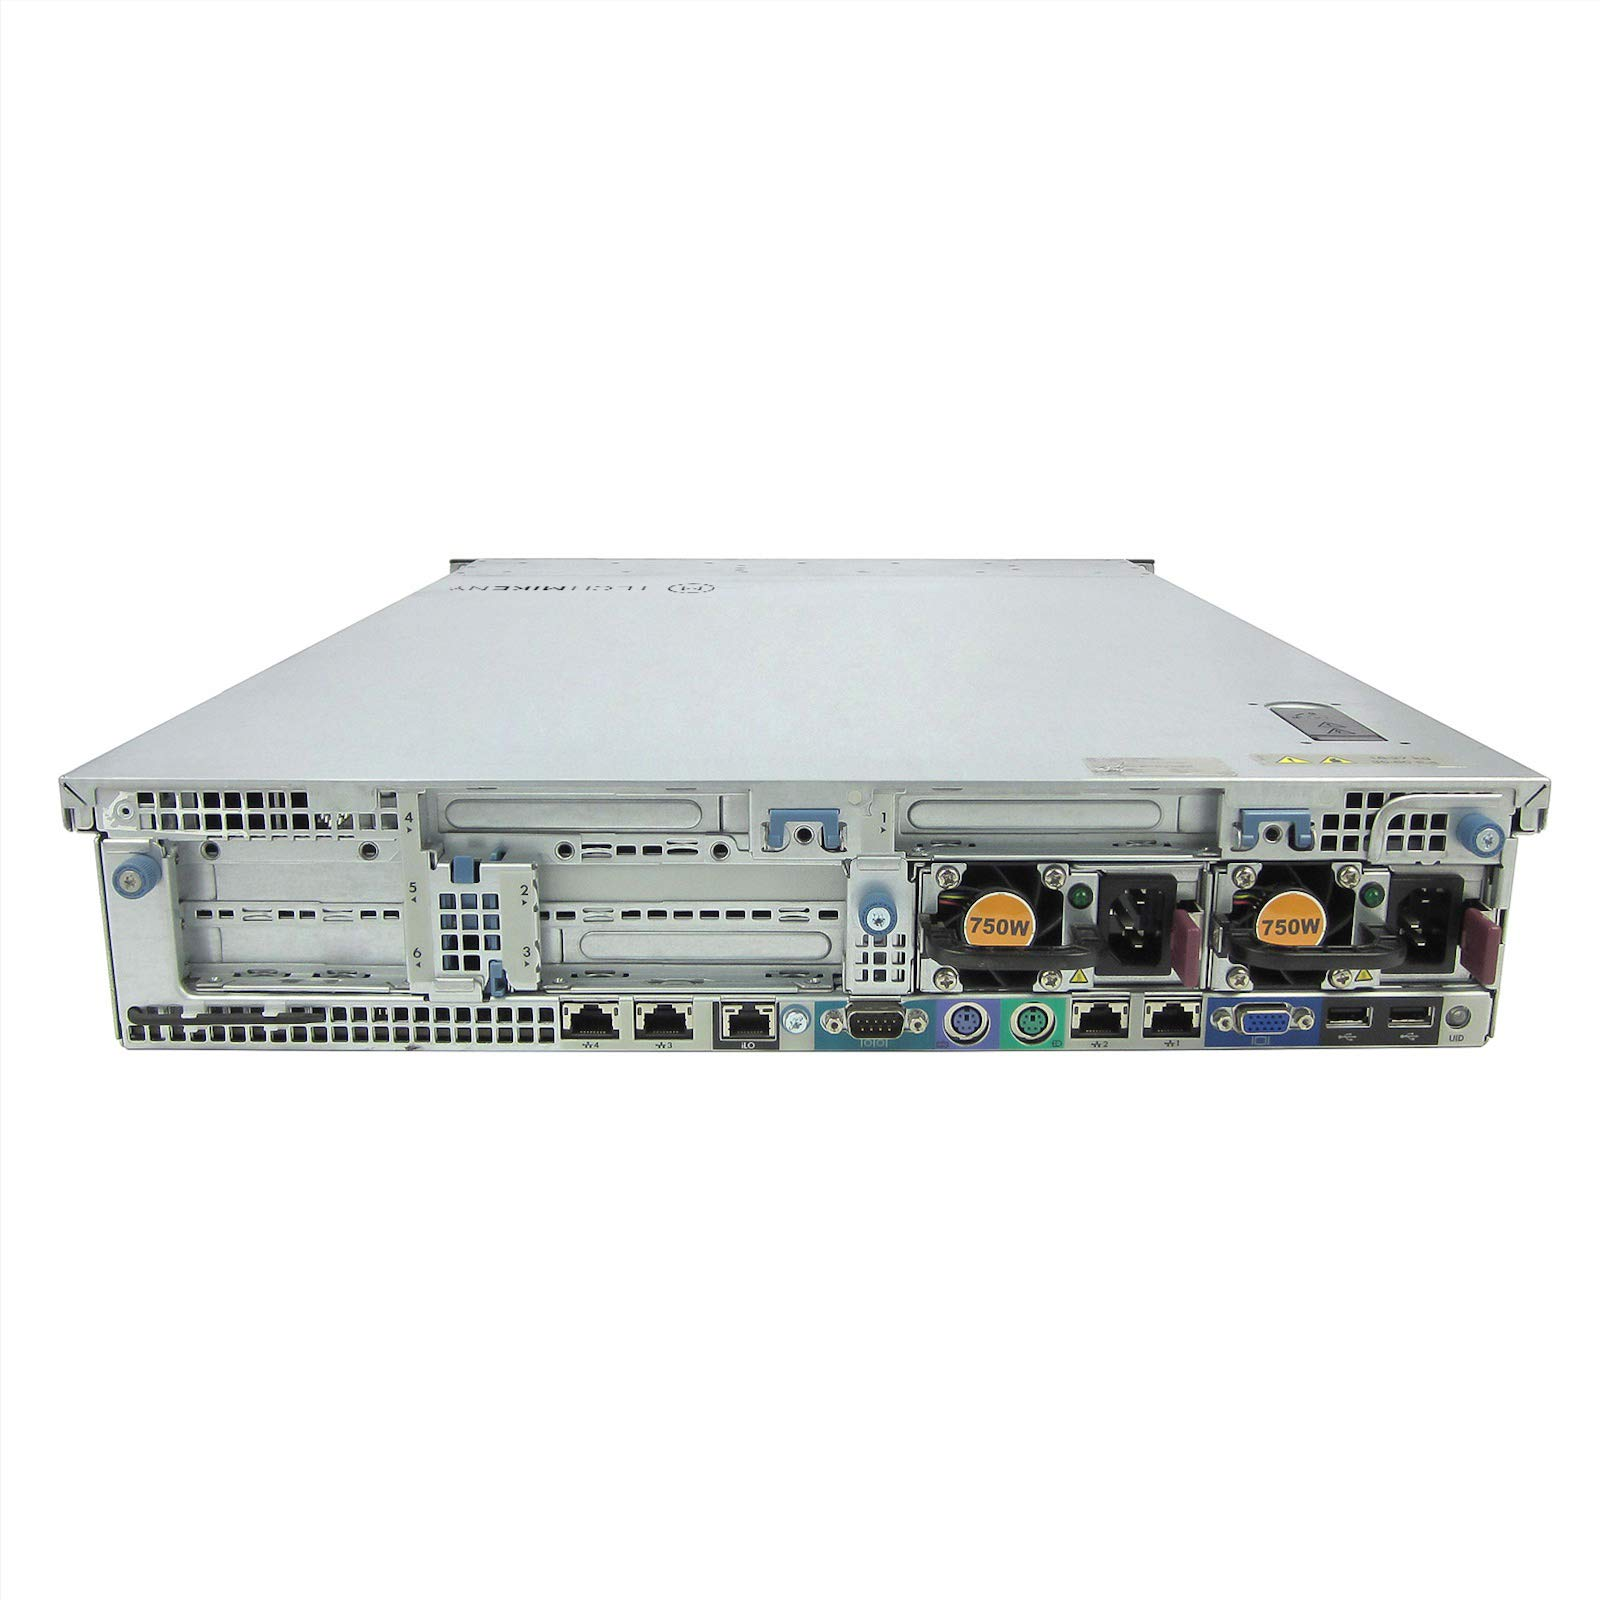 High-End HP ProLiant DL380 G7 Server 2X 3.06Ghz X5675 6C 8GB (Renewed) by HP (Image #3)